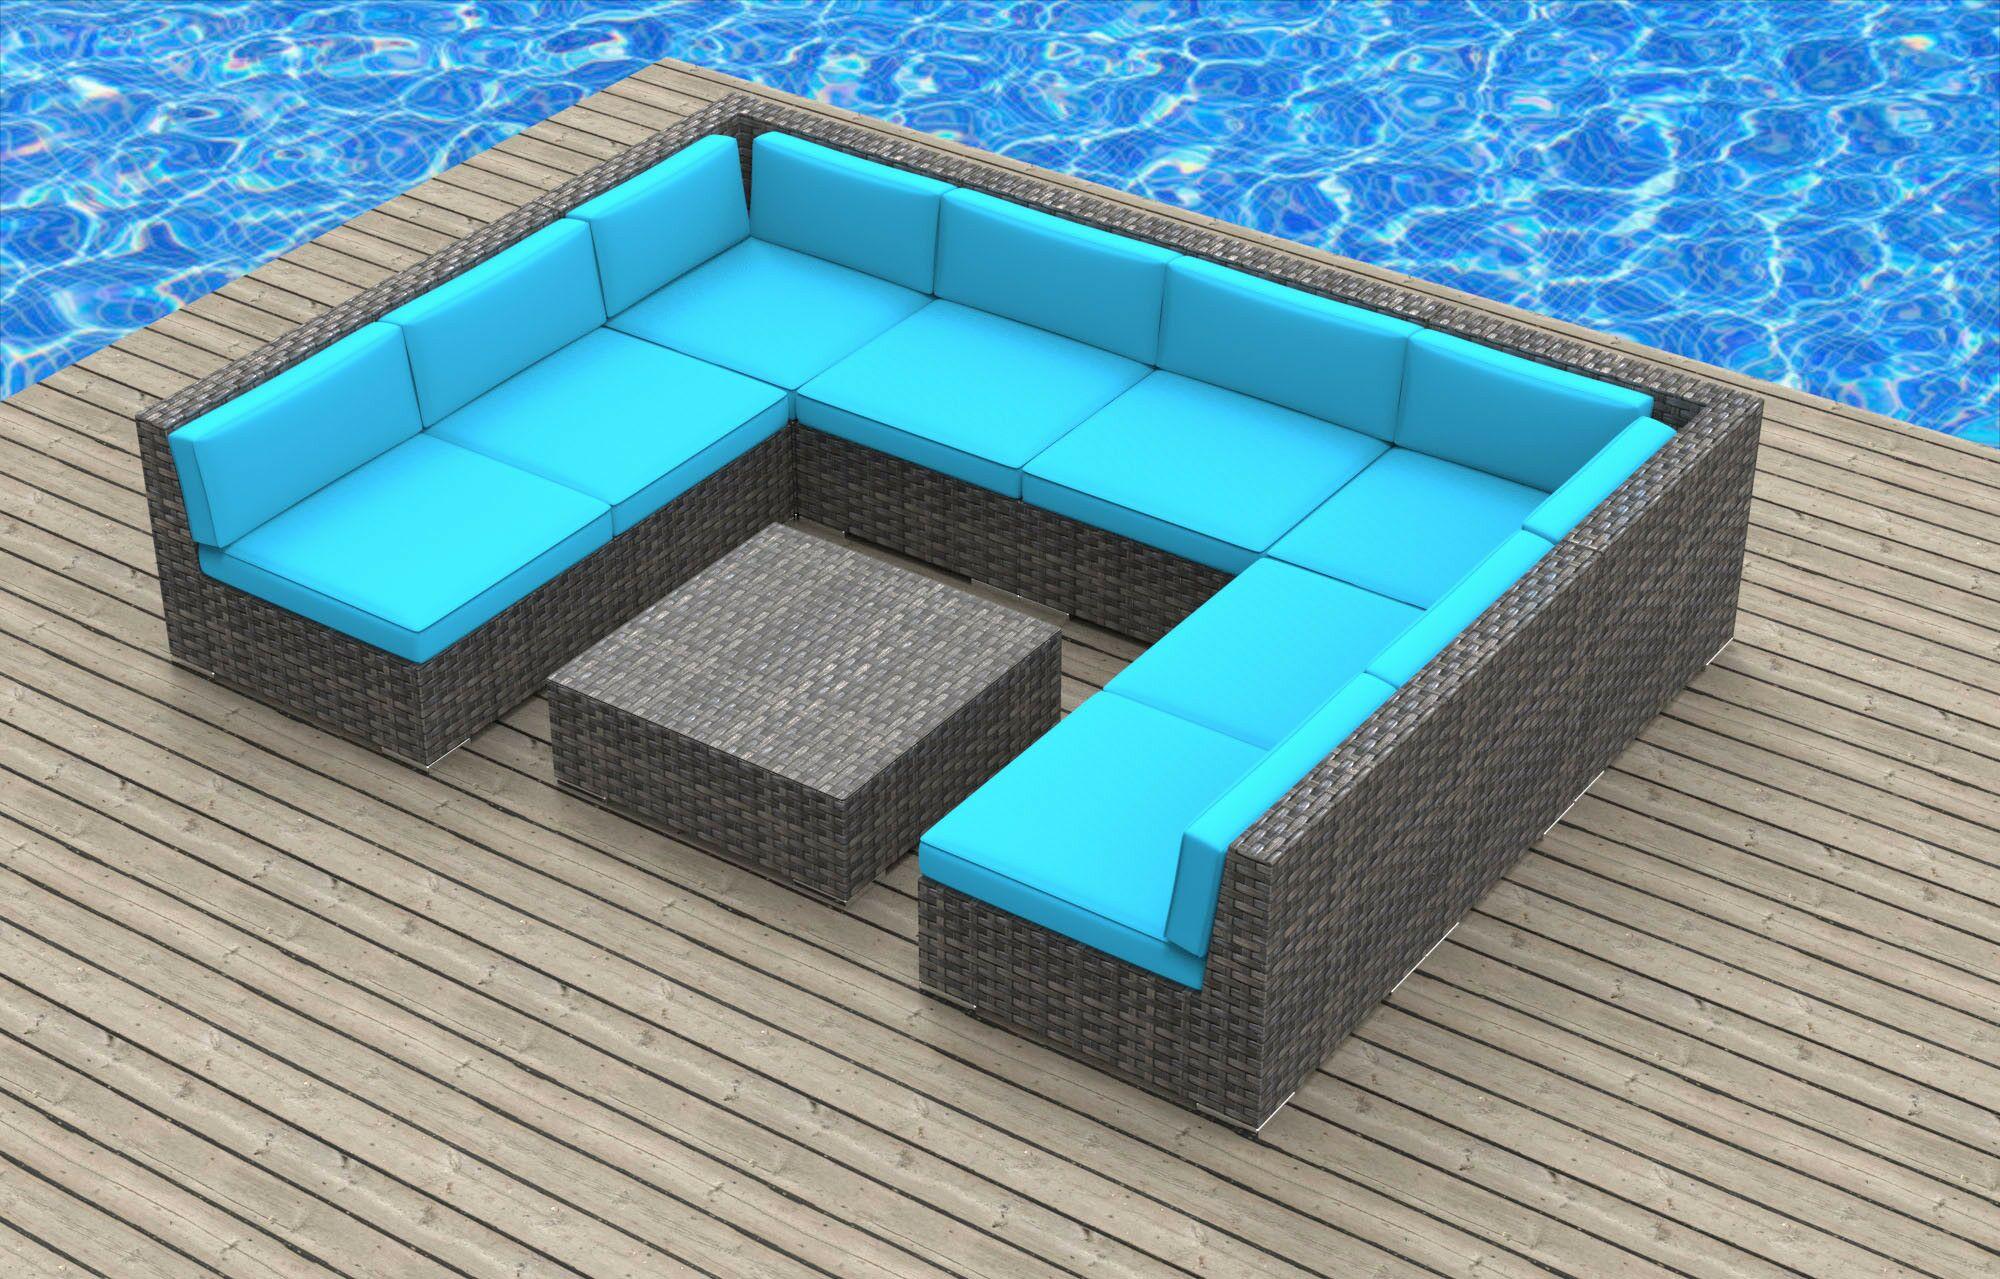 Tahiti 9 Piece Sectional Set with Cushions Fabric: Sea Blue